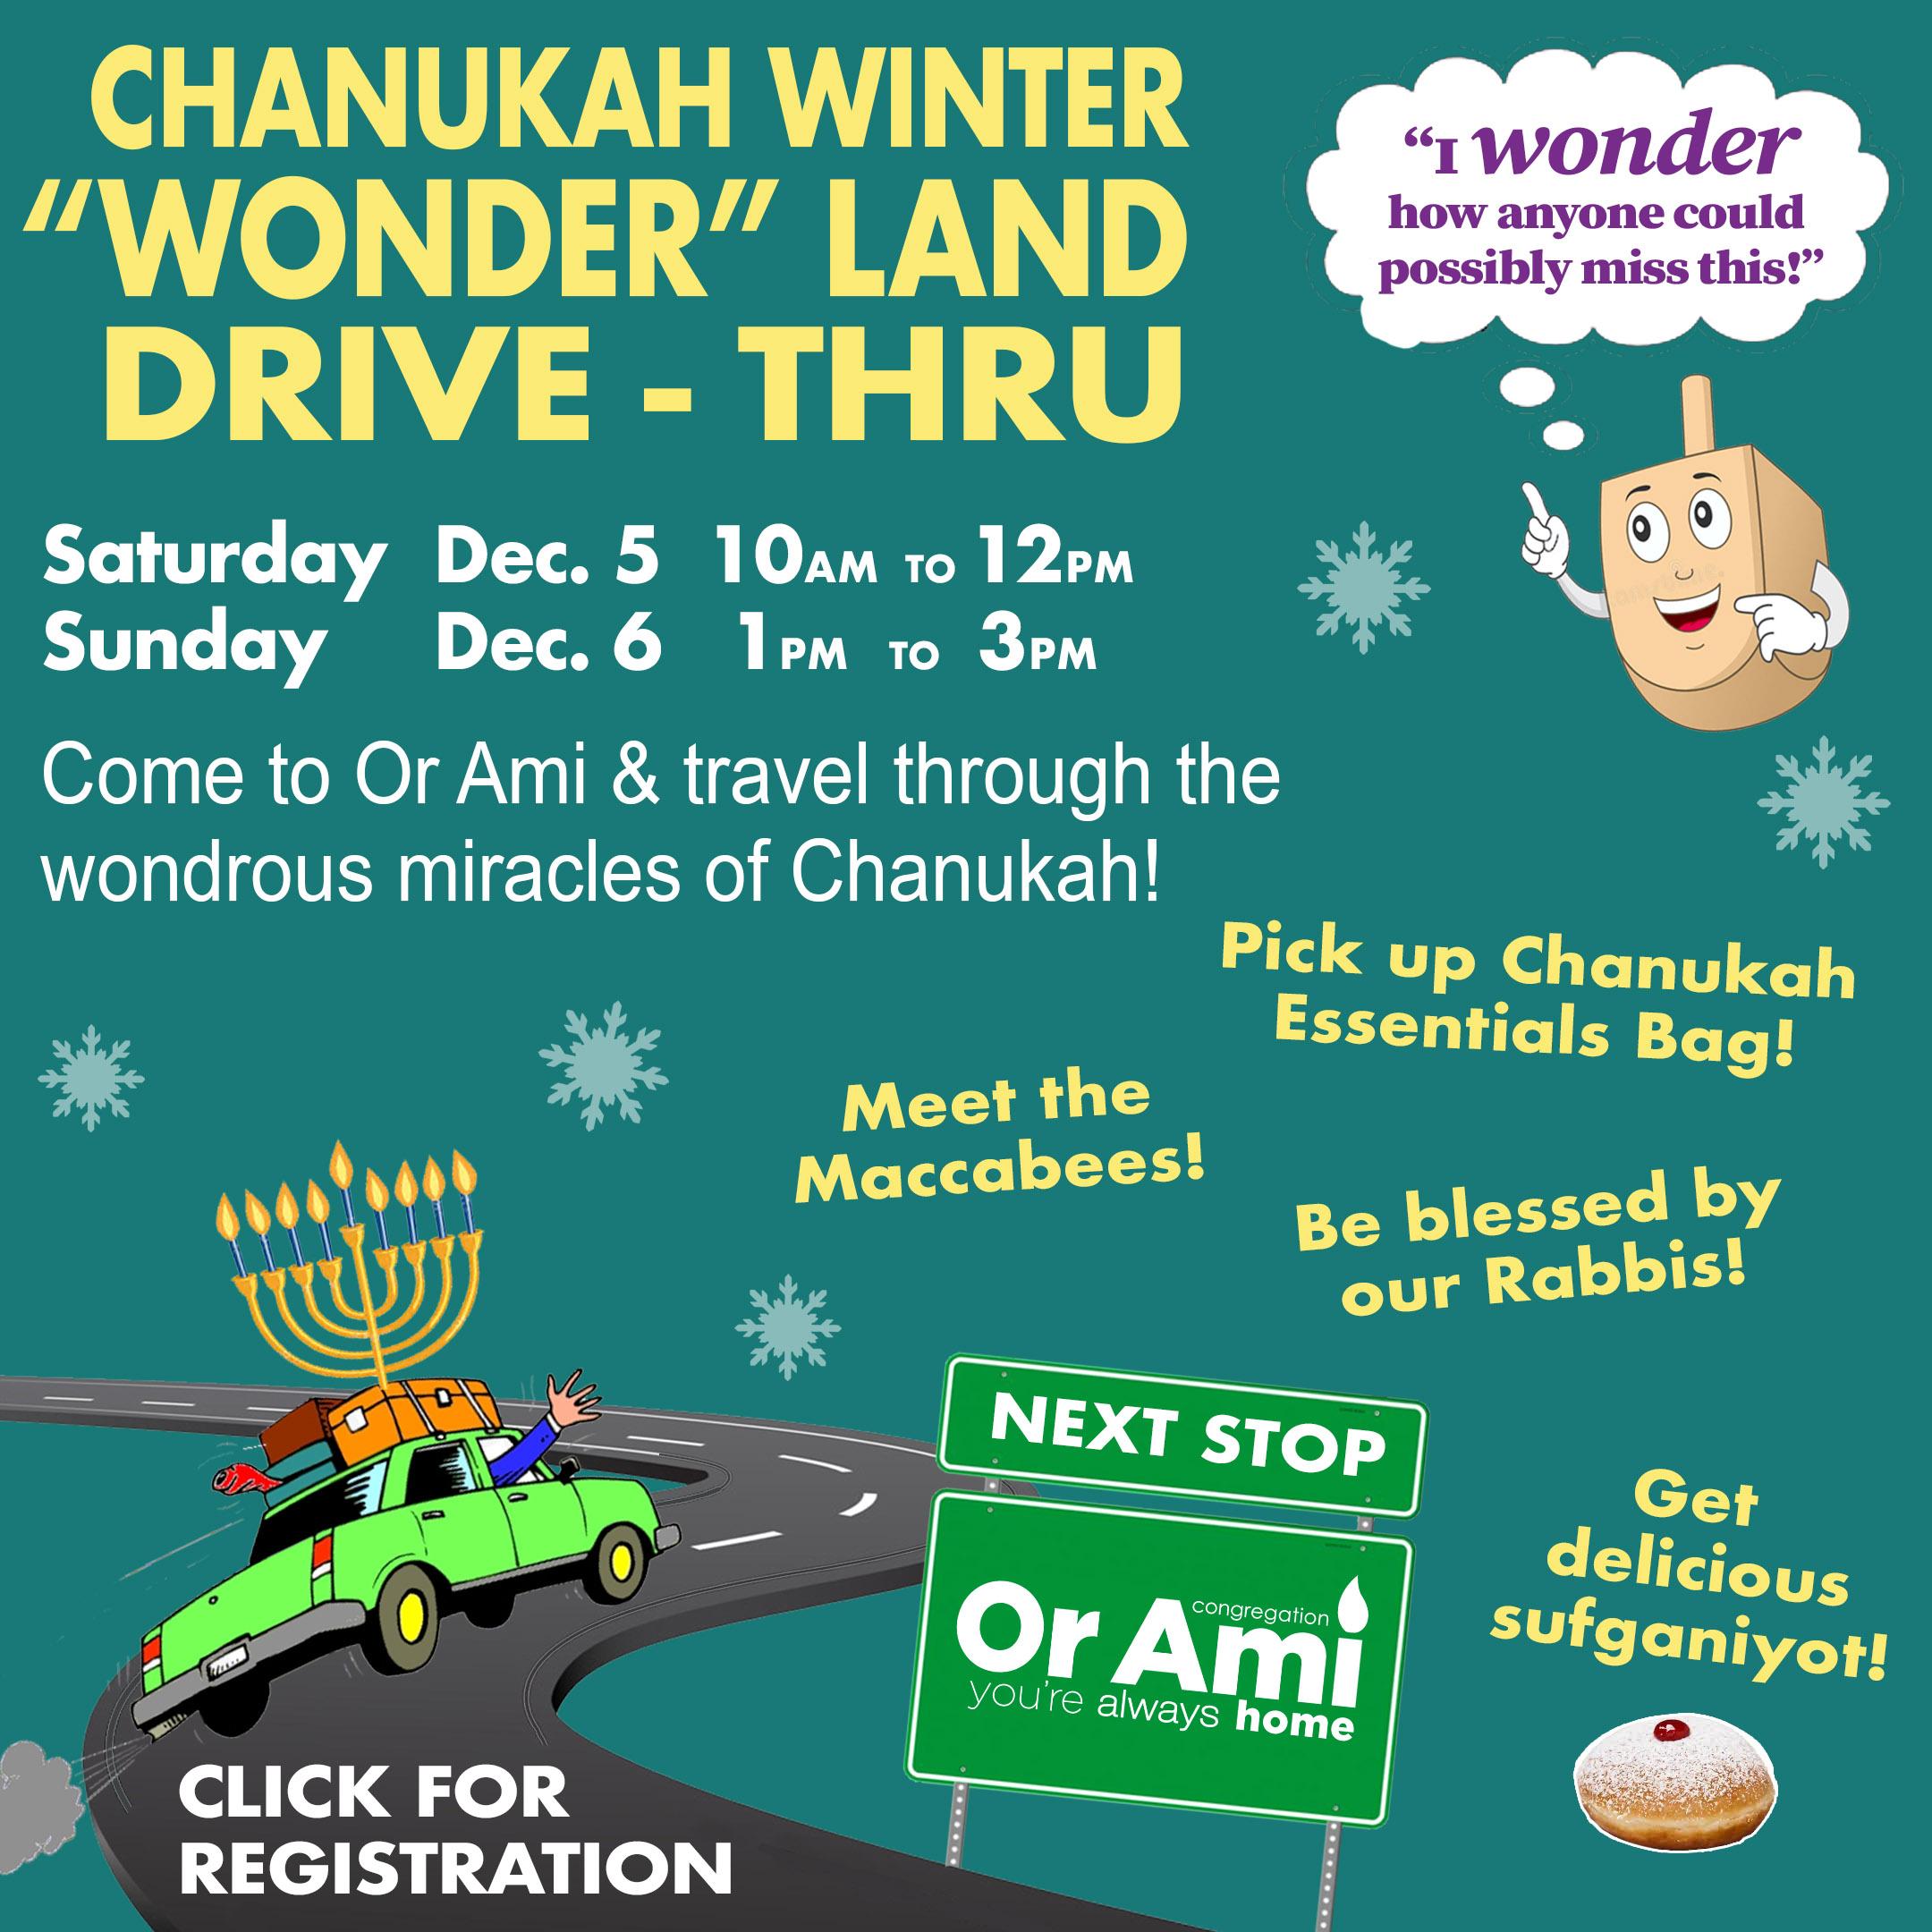 chanukah drive thru with CLICK